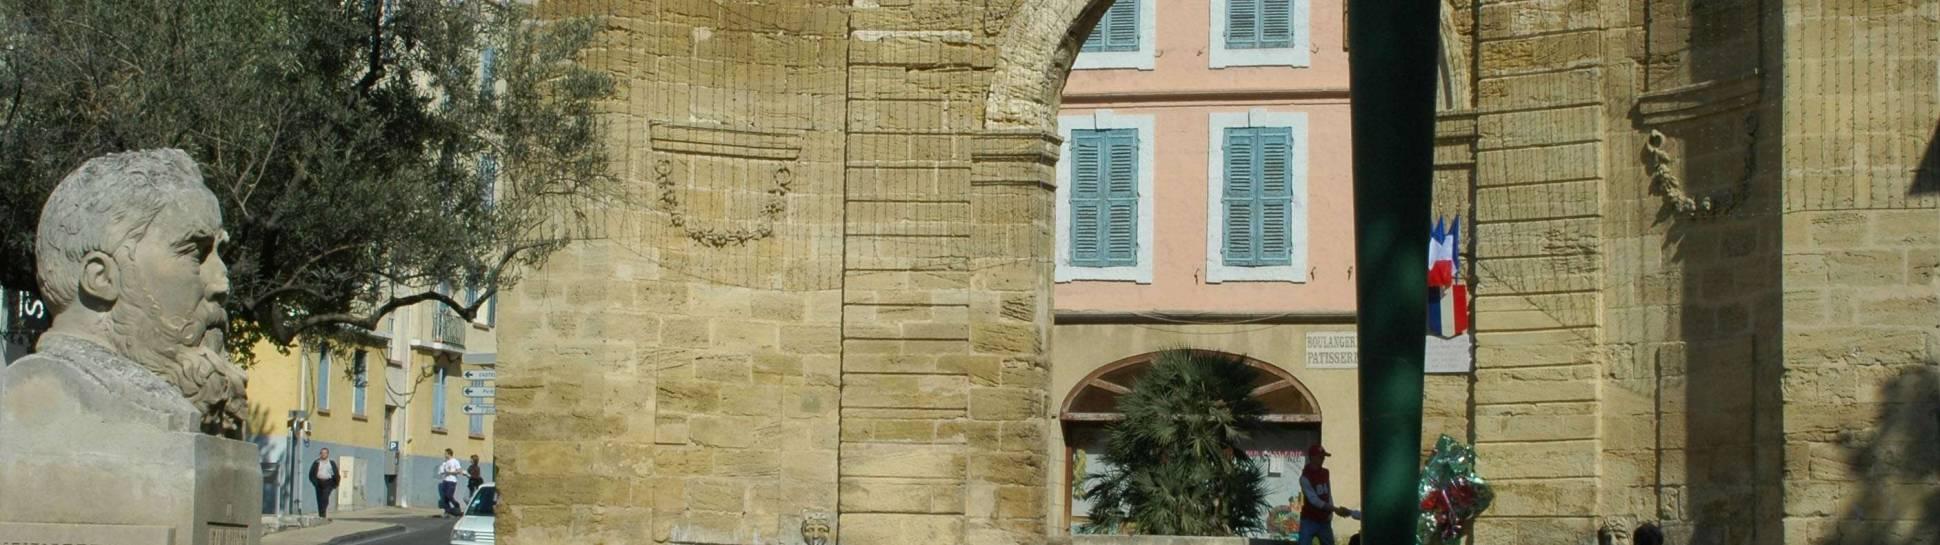 Porte d'Arles Istres, M.Torres